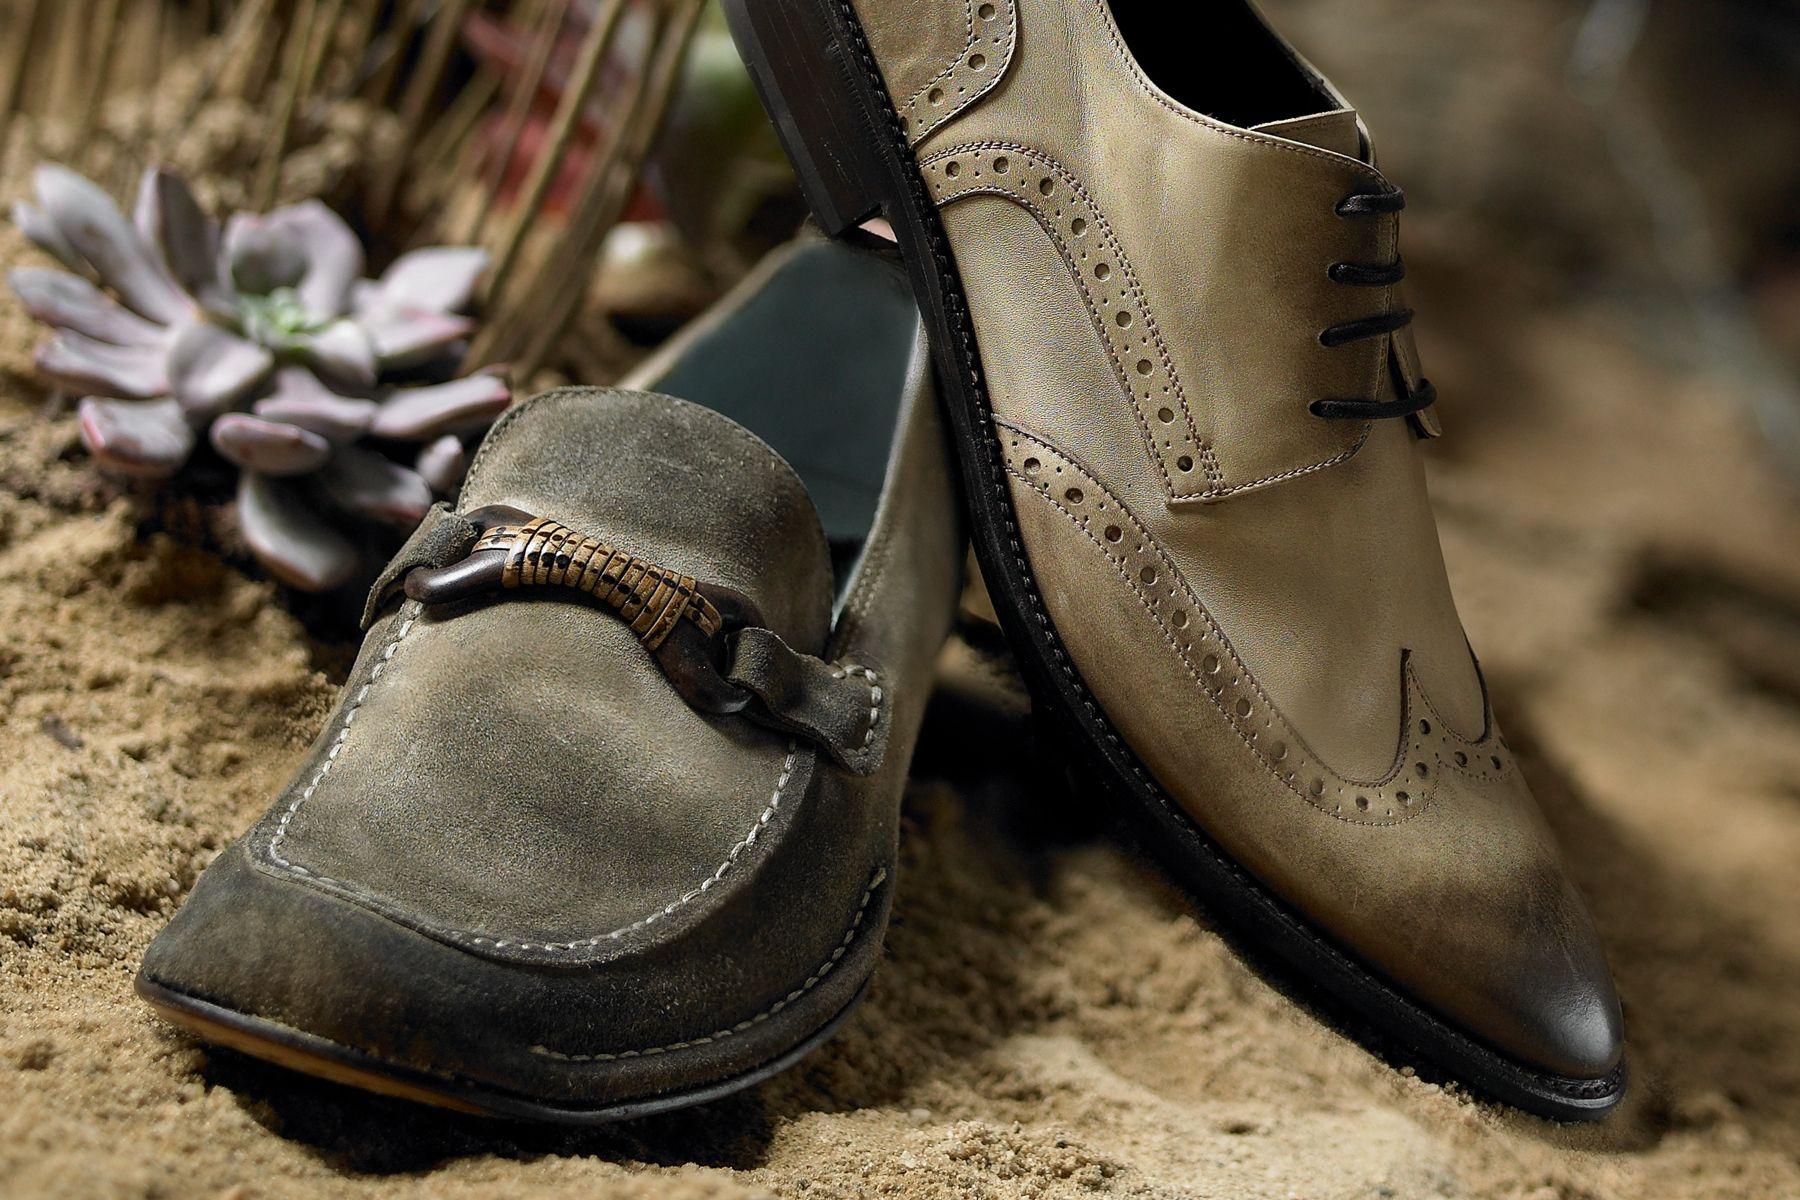 1mens_shoes.jpg